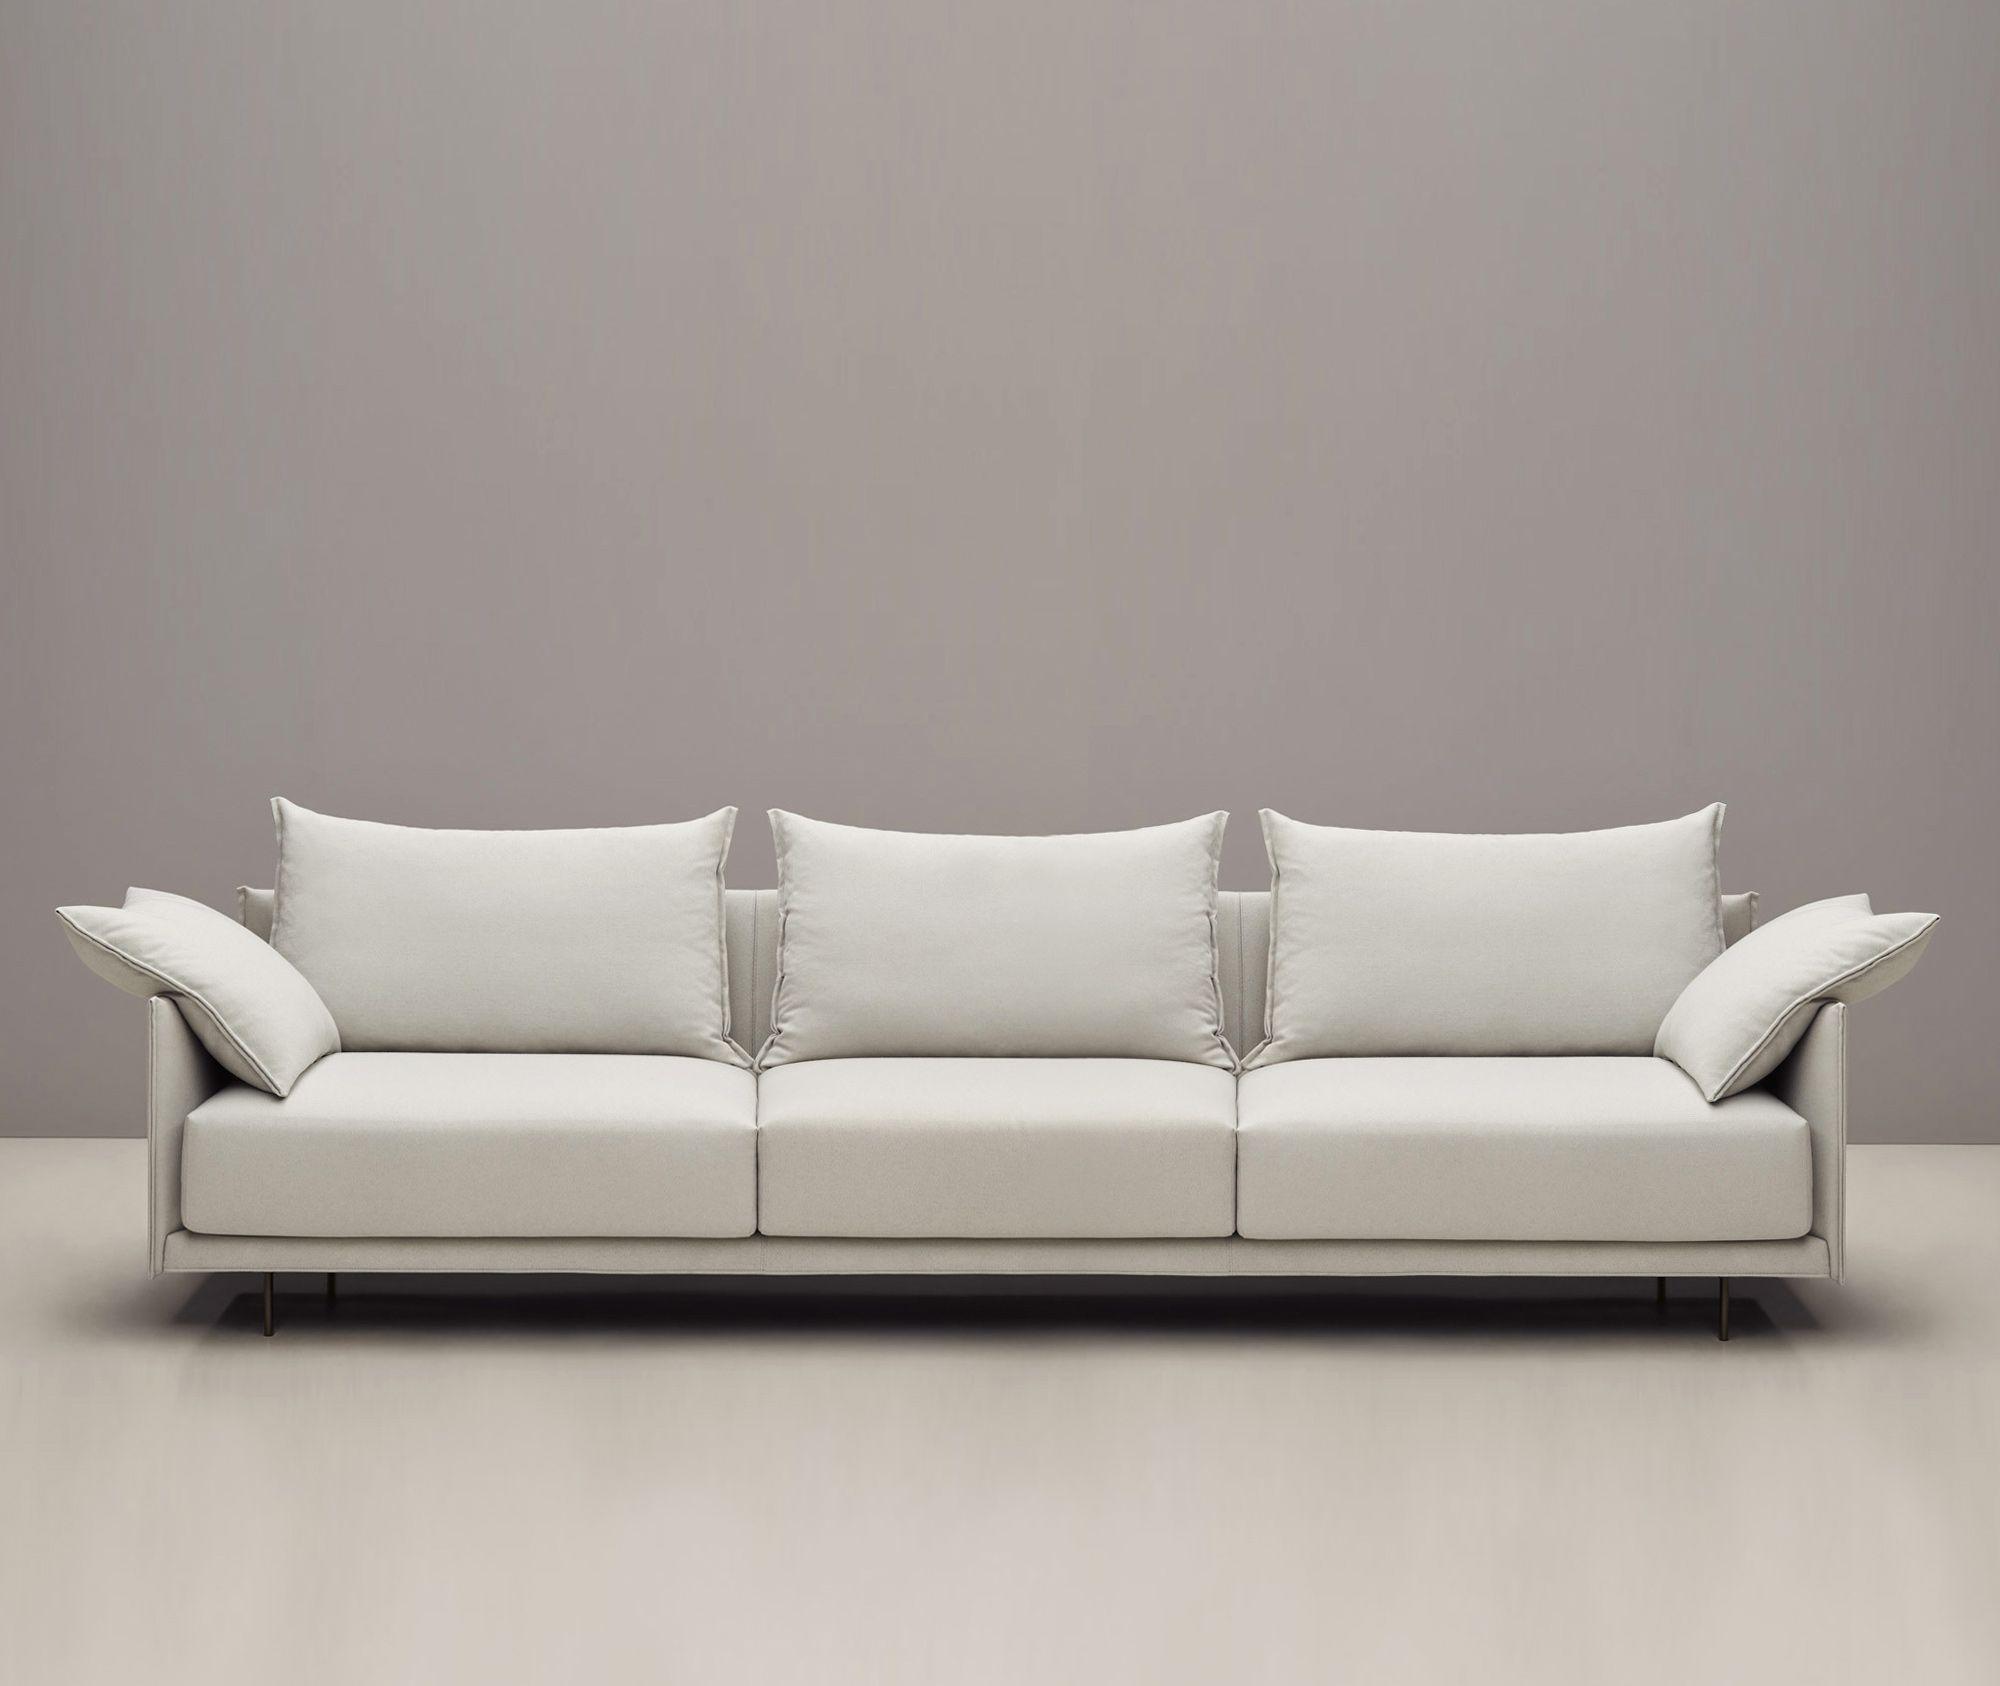 Modern Furniture & Lighting | Spencer Interiors, Vancouver | Modern Italian Sectionals | Luxury Sofa, Minimalist Sofa, Italian Sofa